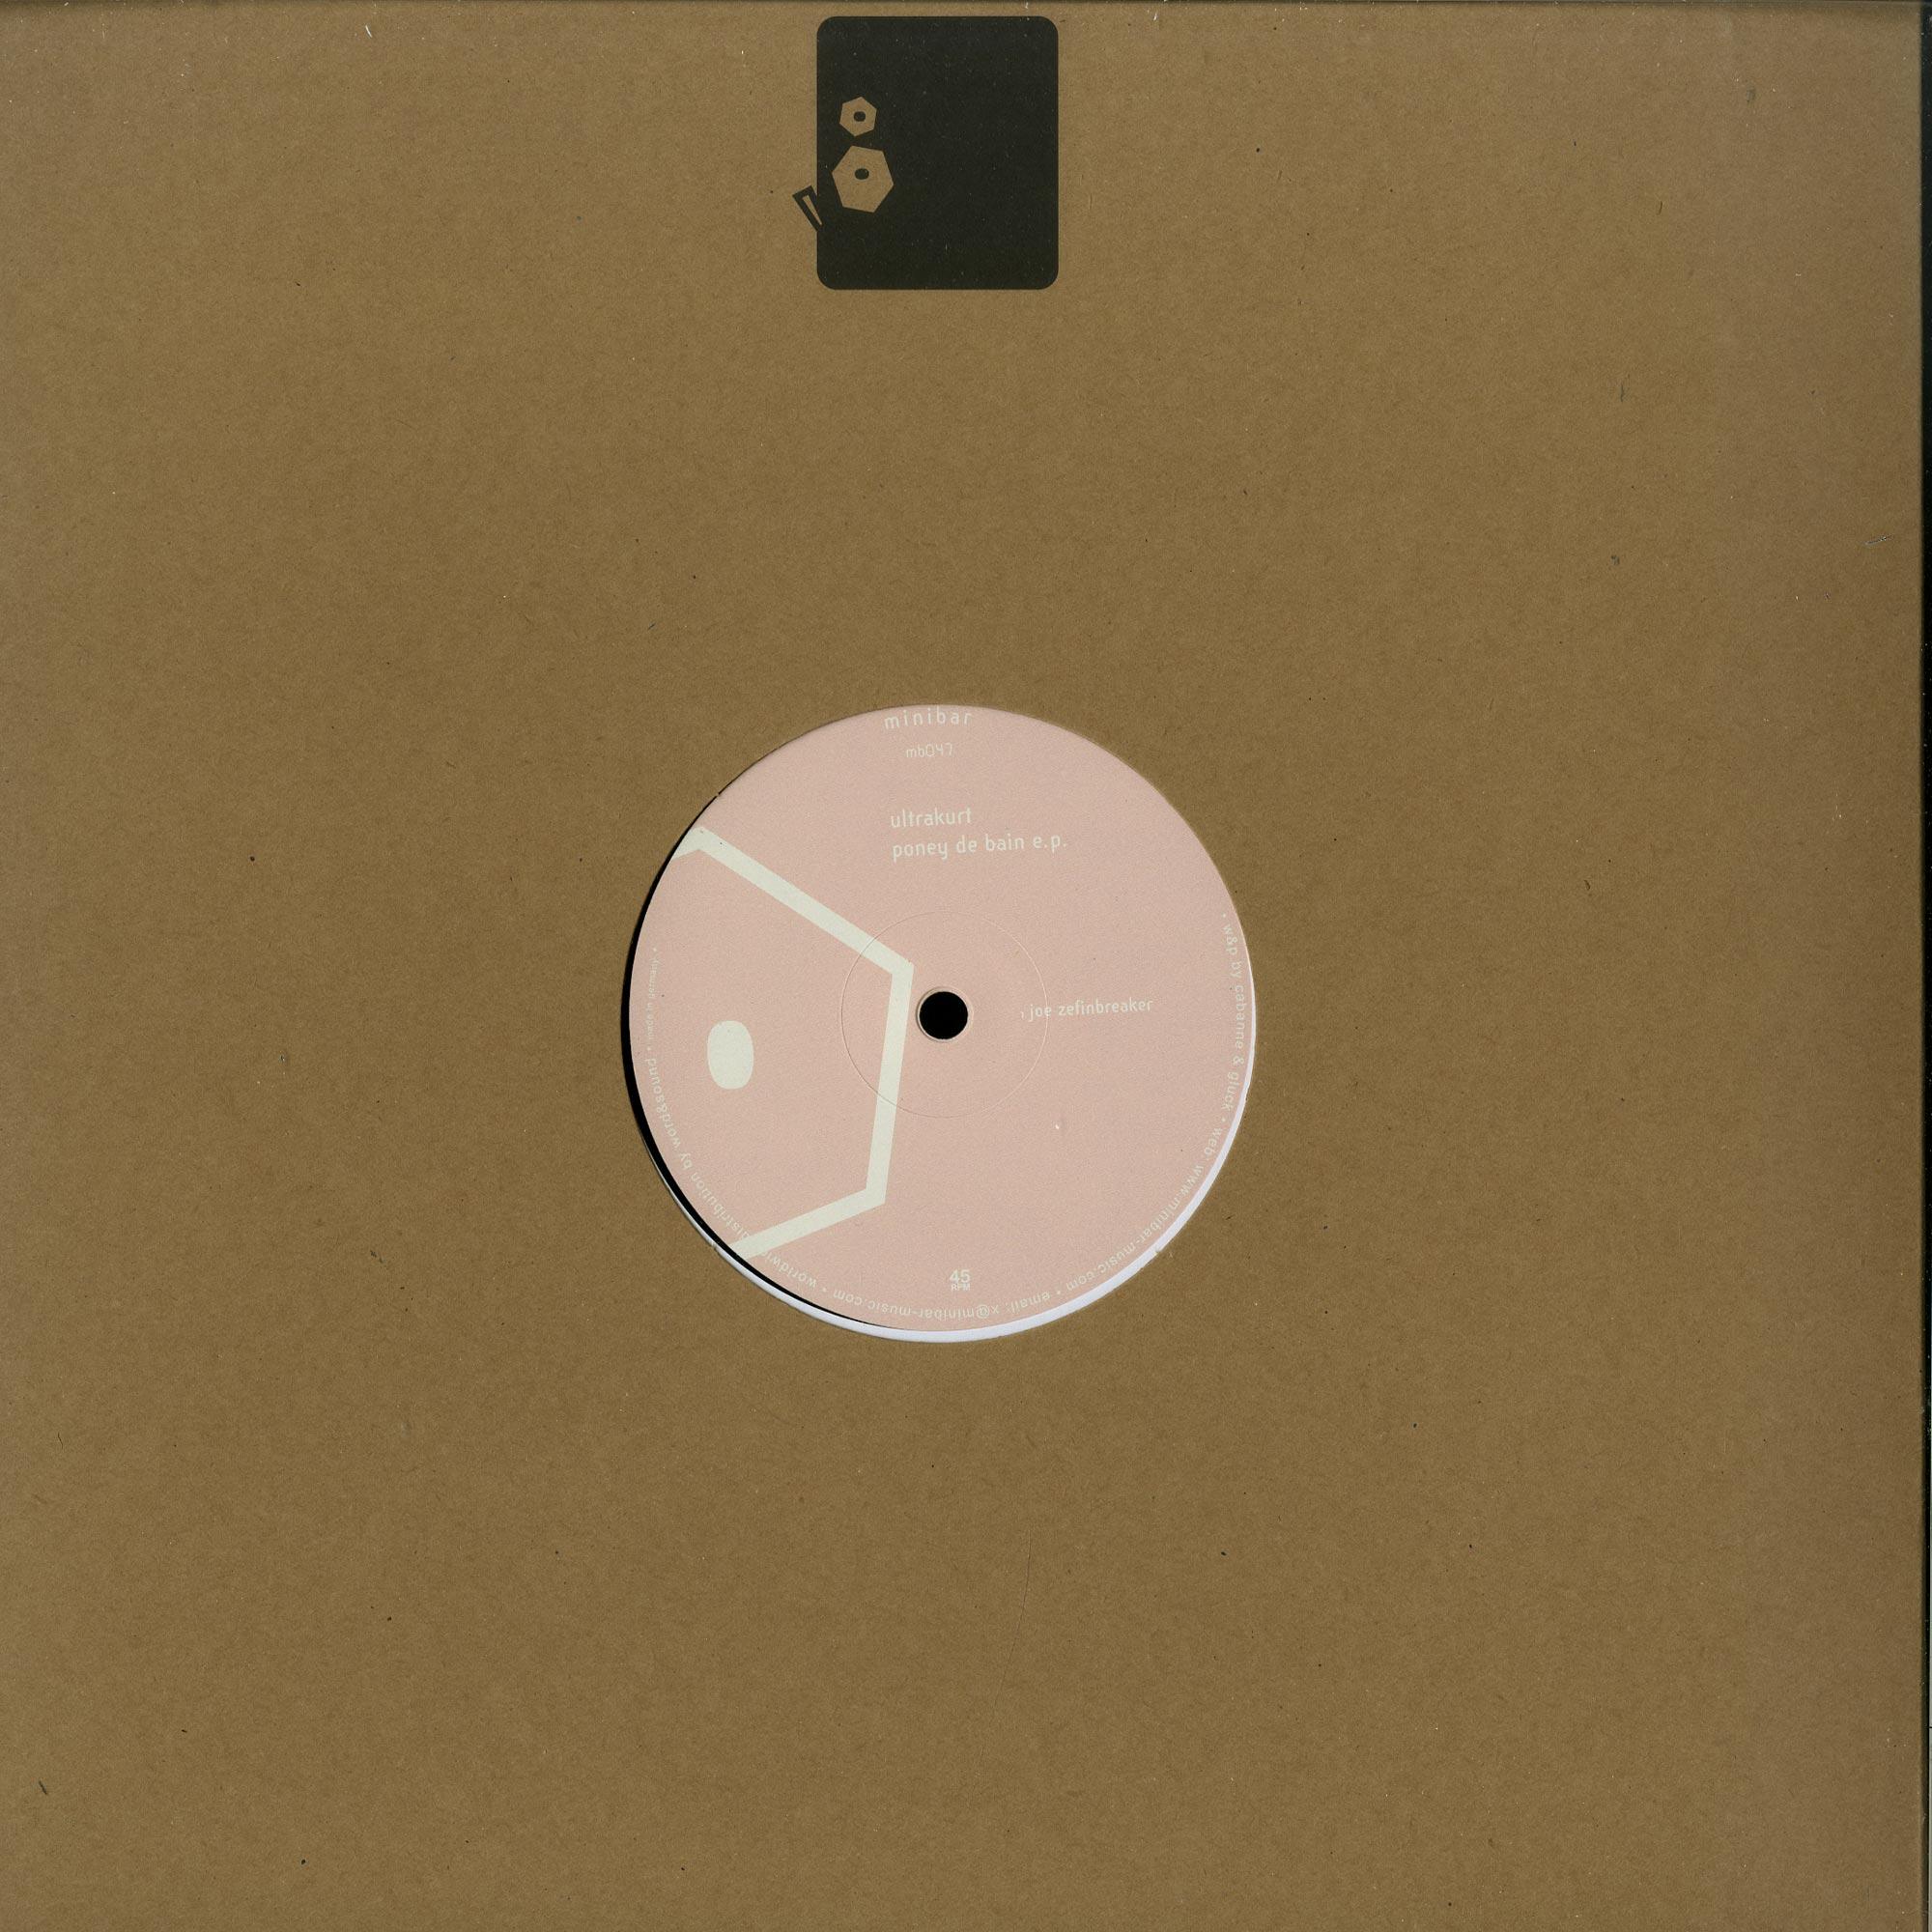 Ultrakurt - PONEY DE BAIN EP